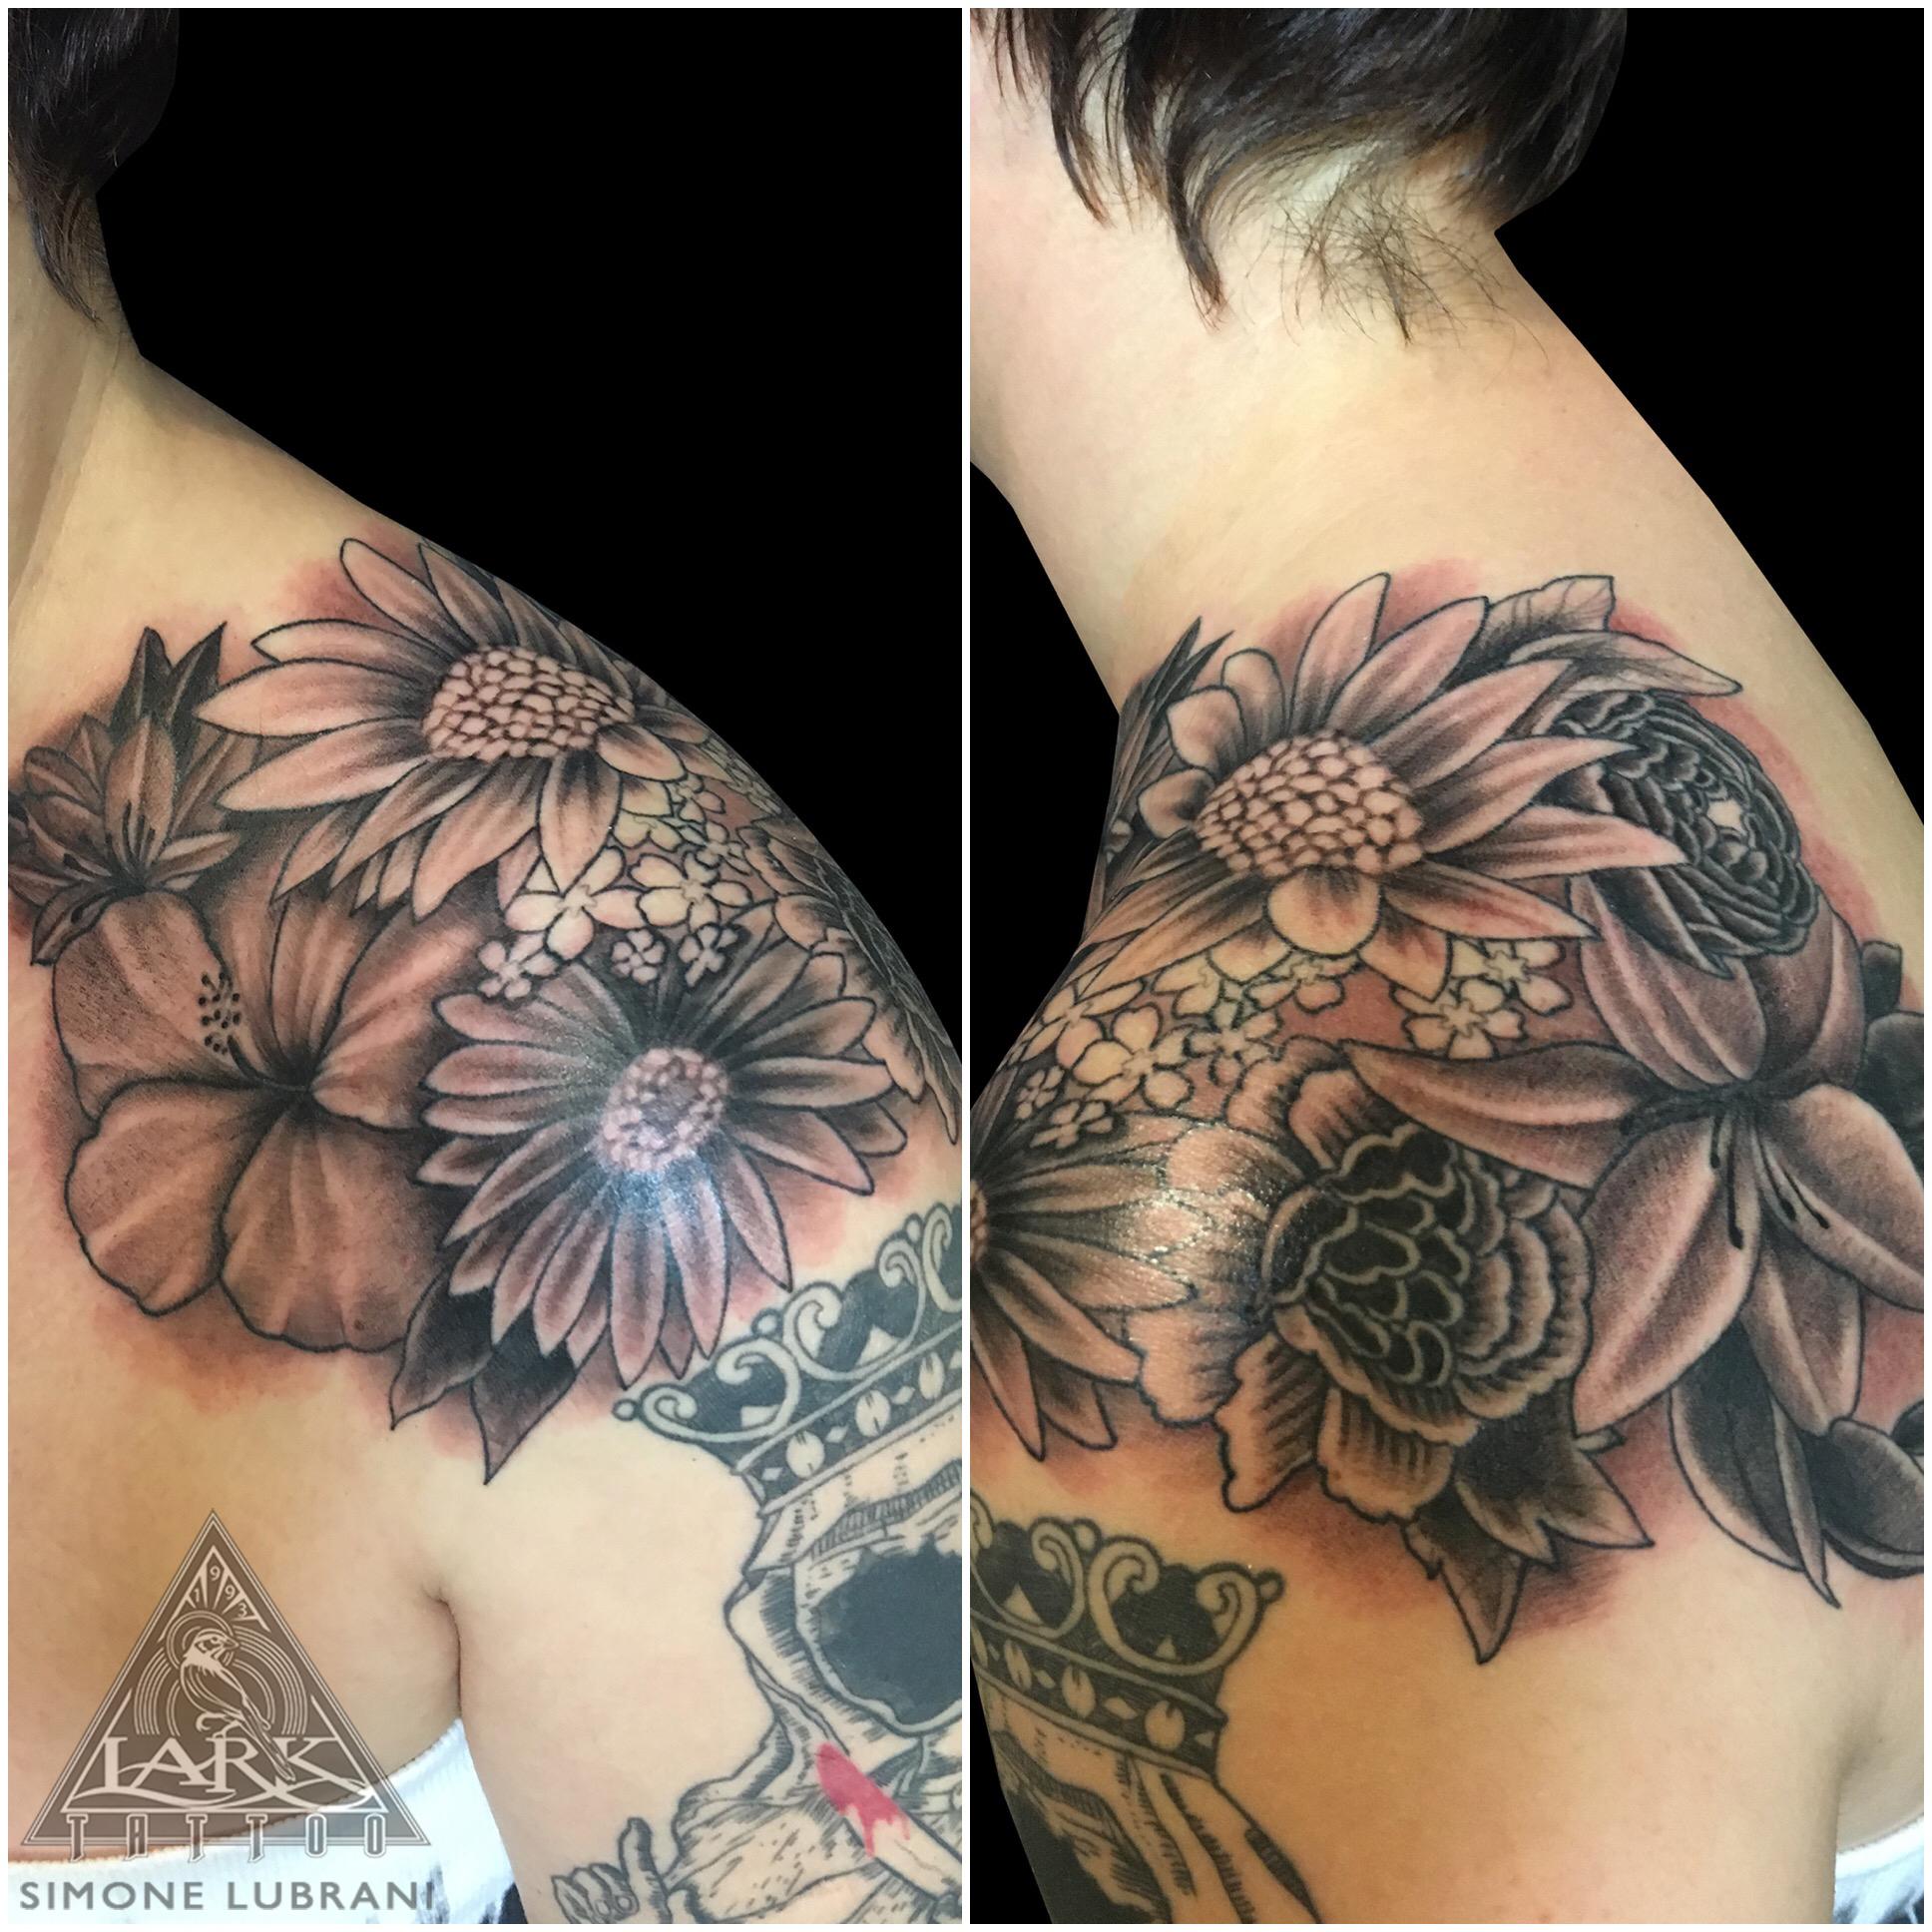 bng, bngtattoo, blackandgraytattoo, blackandgreytattoo, bngink, bnginksociety, flower, flowertattoo, flowers, flowerstattoo, shouldertattoo, tattoo, tattoos, tat, tats, tatts, tatted, tattedup, tattoist, tattooed, inked, inkedup, ink, tattoooftheday, amazingink, bodyart, tattooig, tattoosofinstagram, instatats , larktattoo, larktattoos, larktattoowestbury, westbury, longisland, NY, NewYork, usa, art